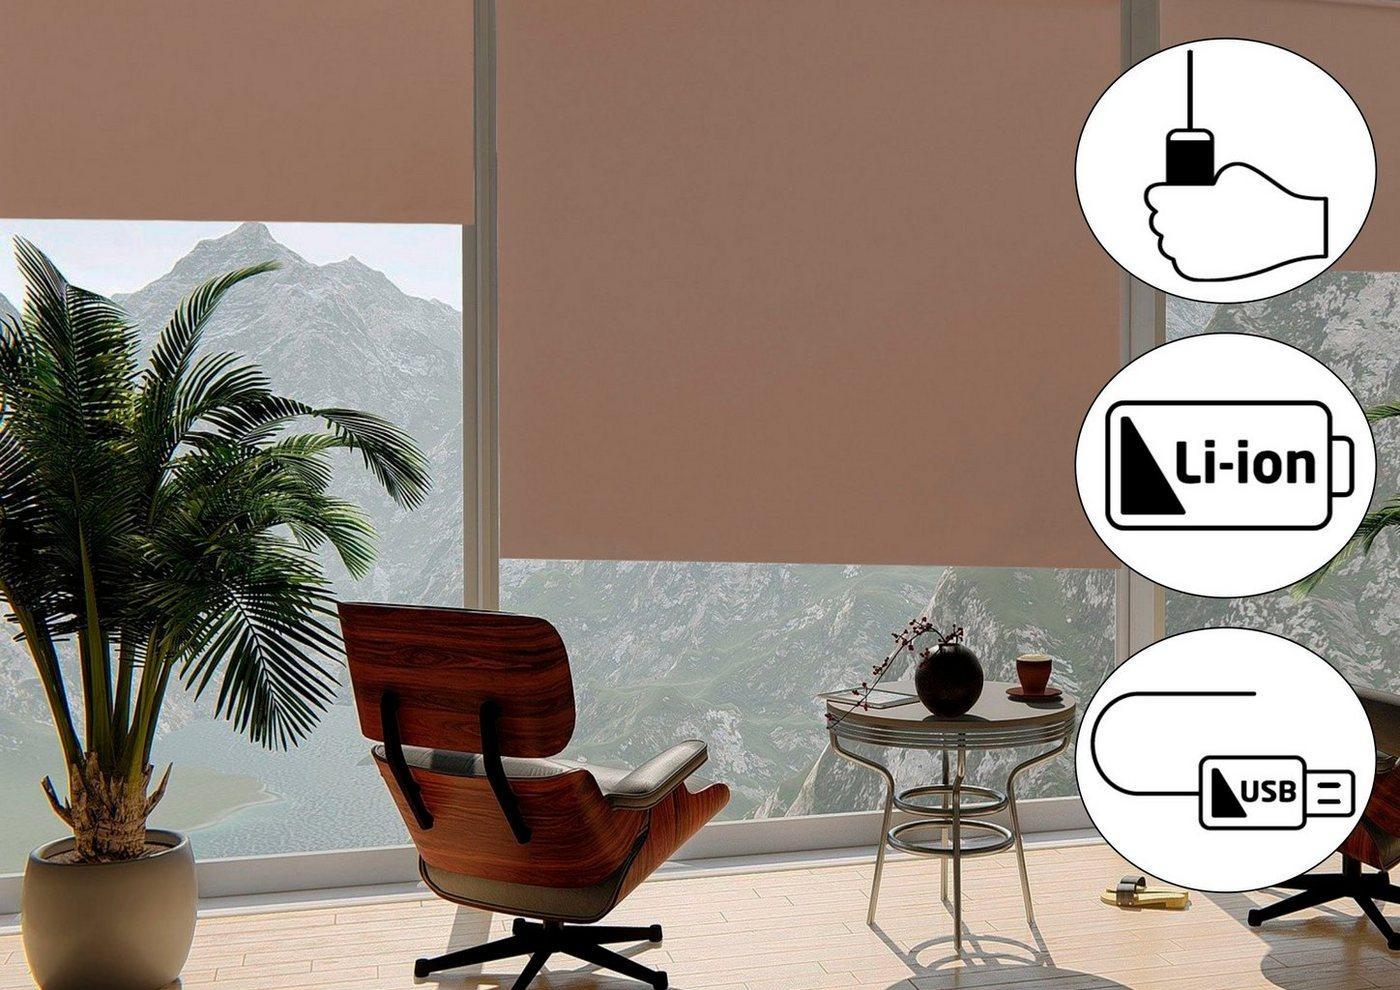 Seitenzugrollo »Classic Style Akku-Rollo«, sunlines, verdunkelnd, freihängend, Made in Germany, beige